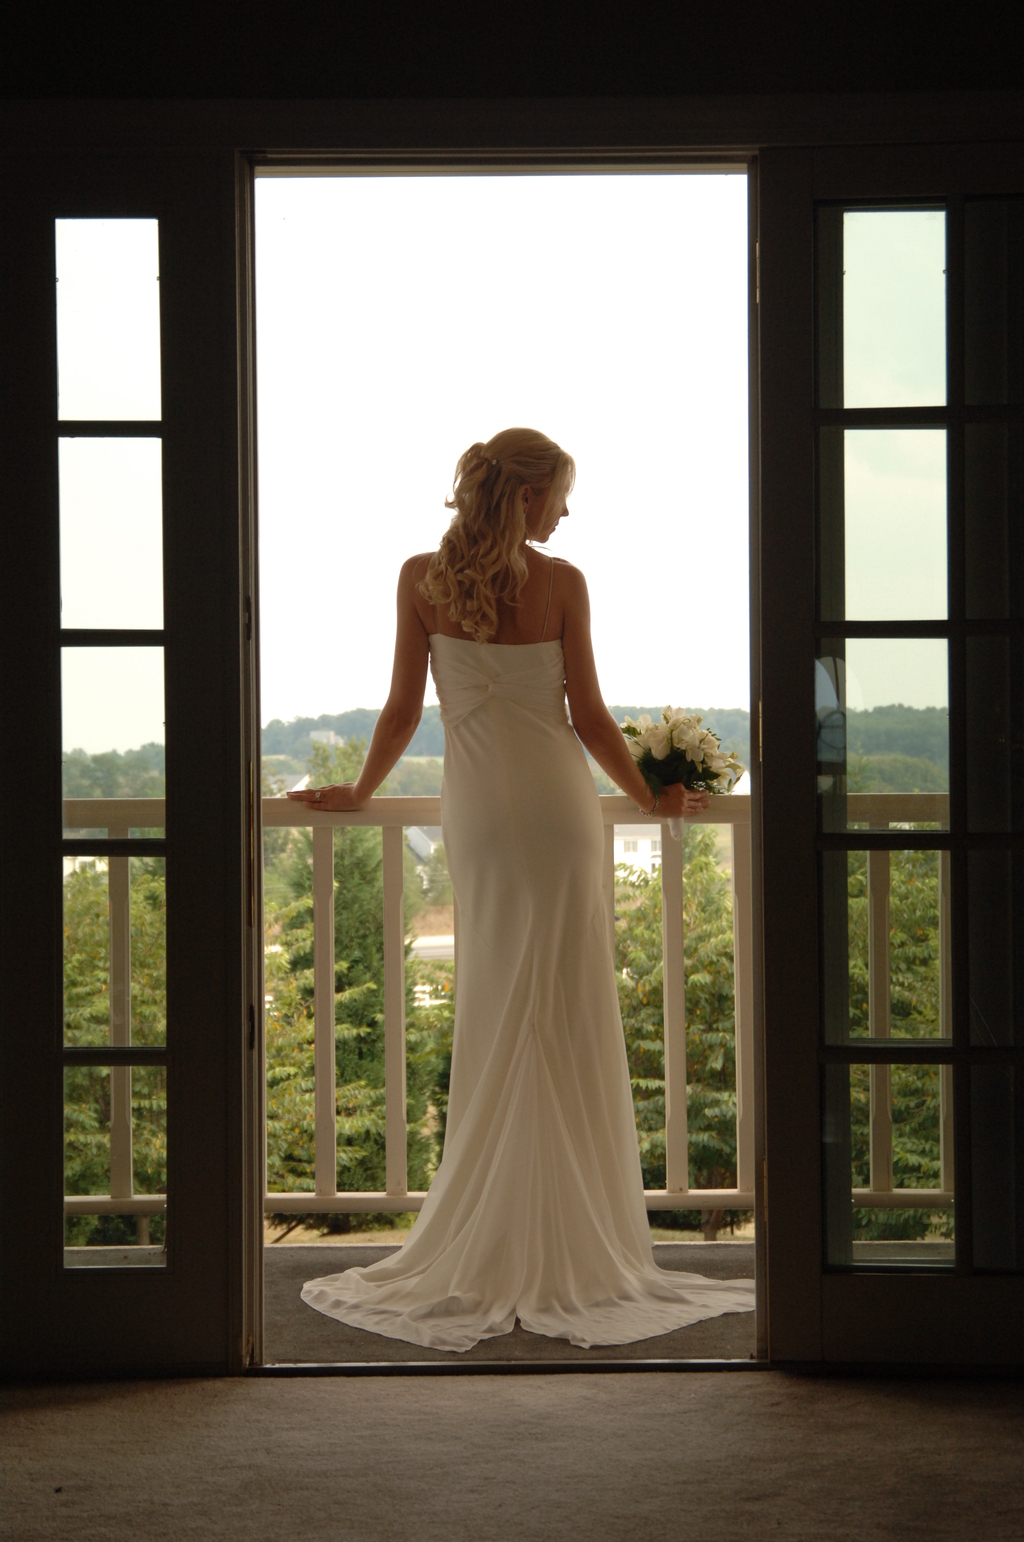 Bride%20on%20top%20balcony.full